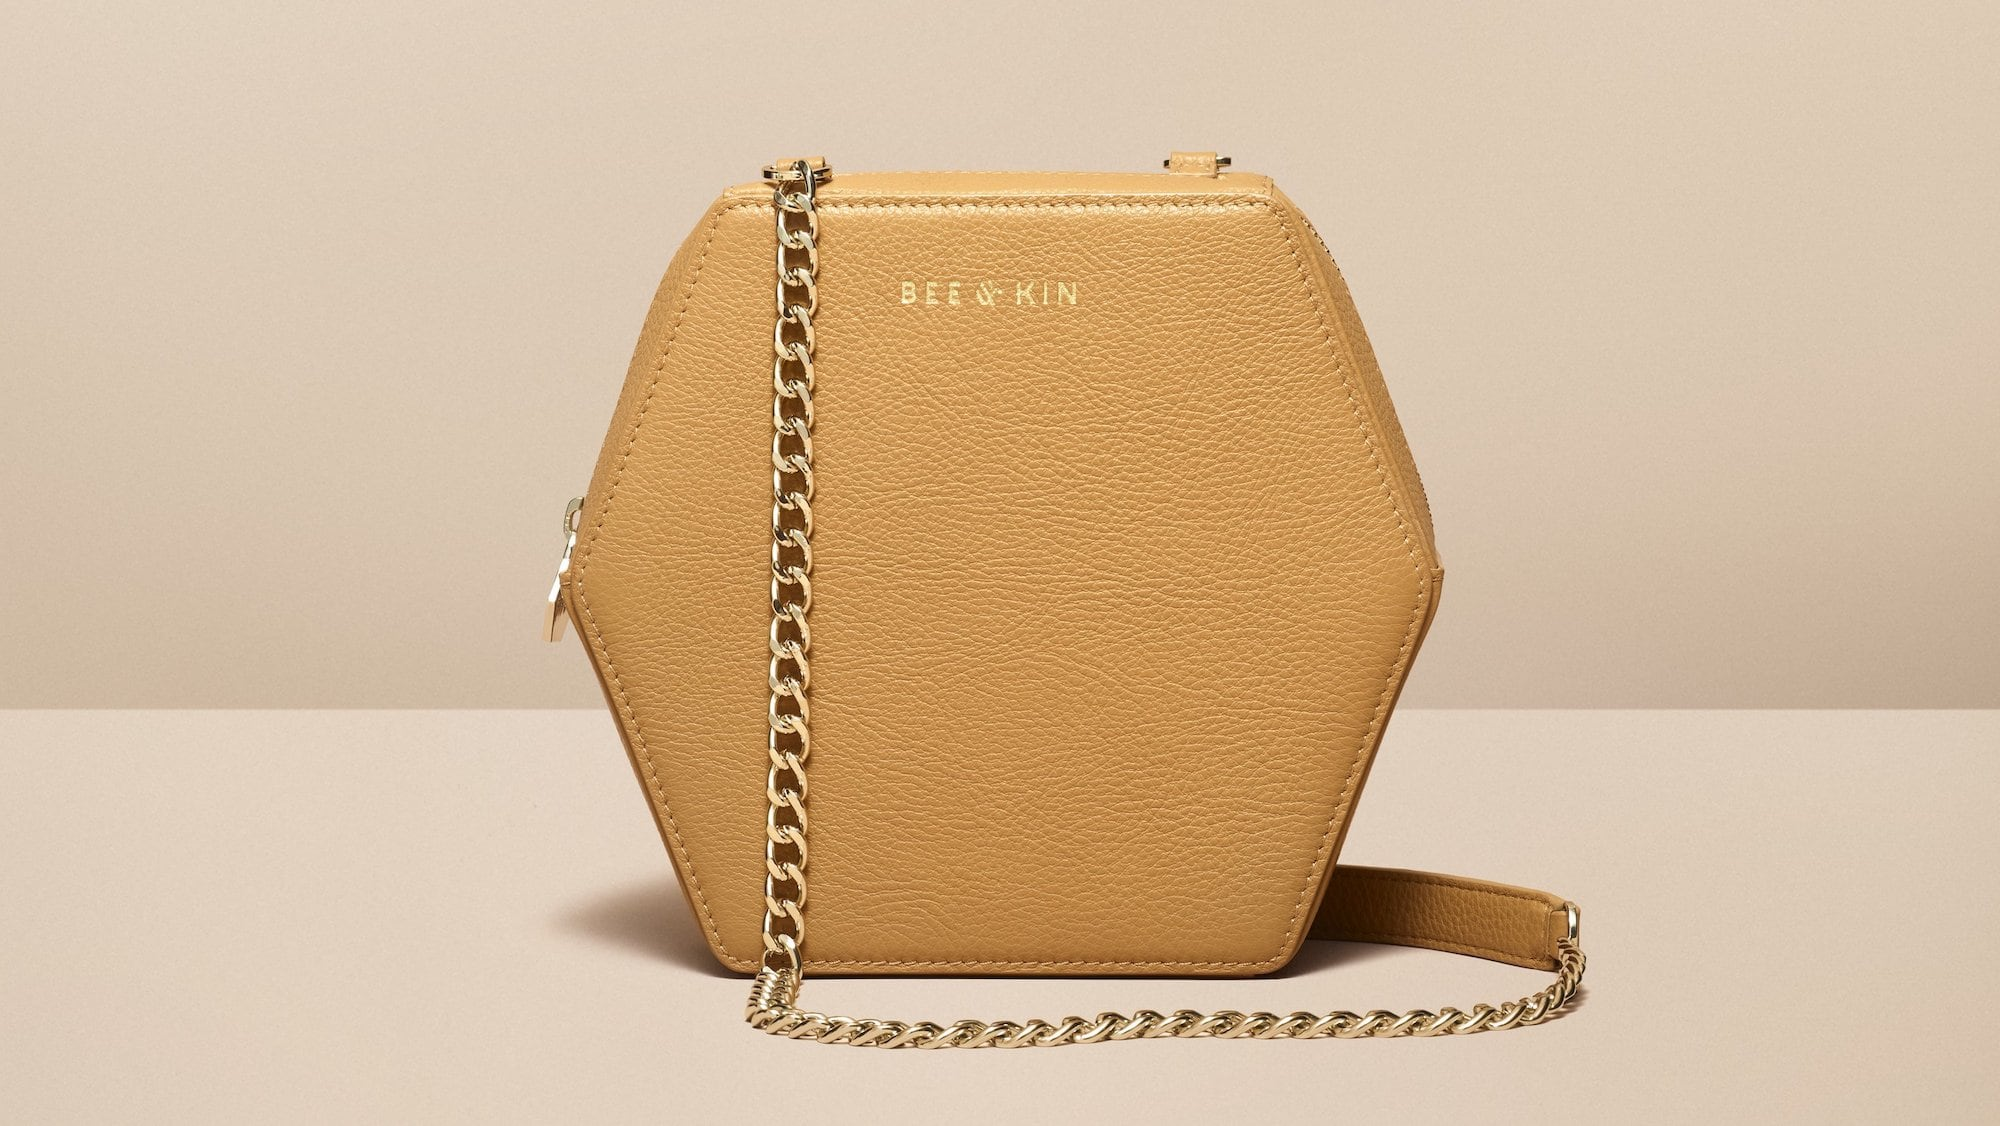 BEE AND KIN DesignTech Smart Bag Collection